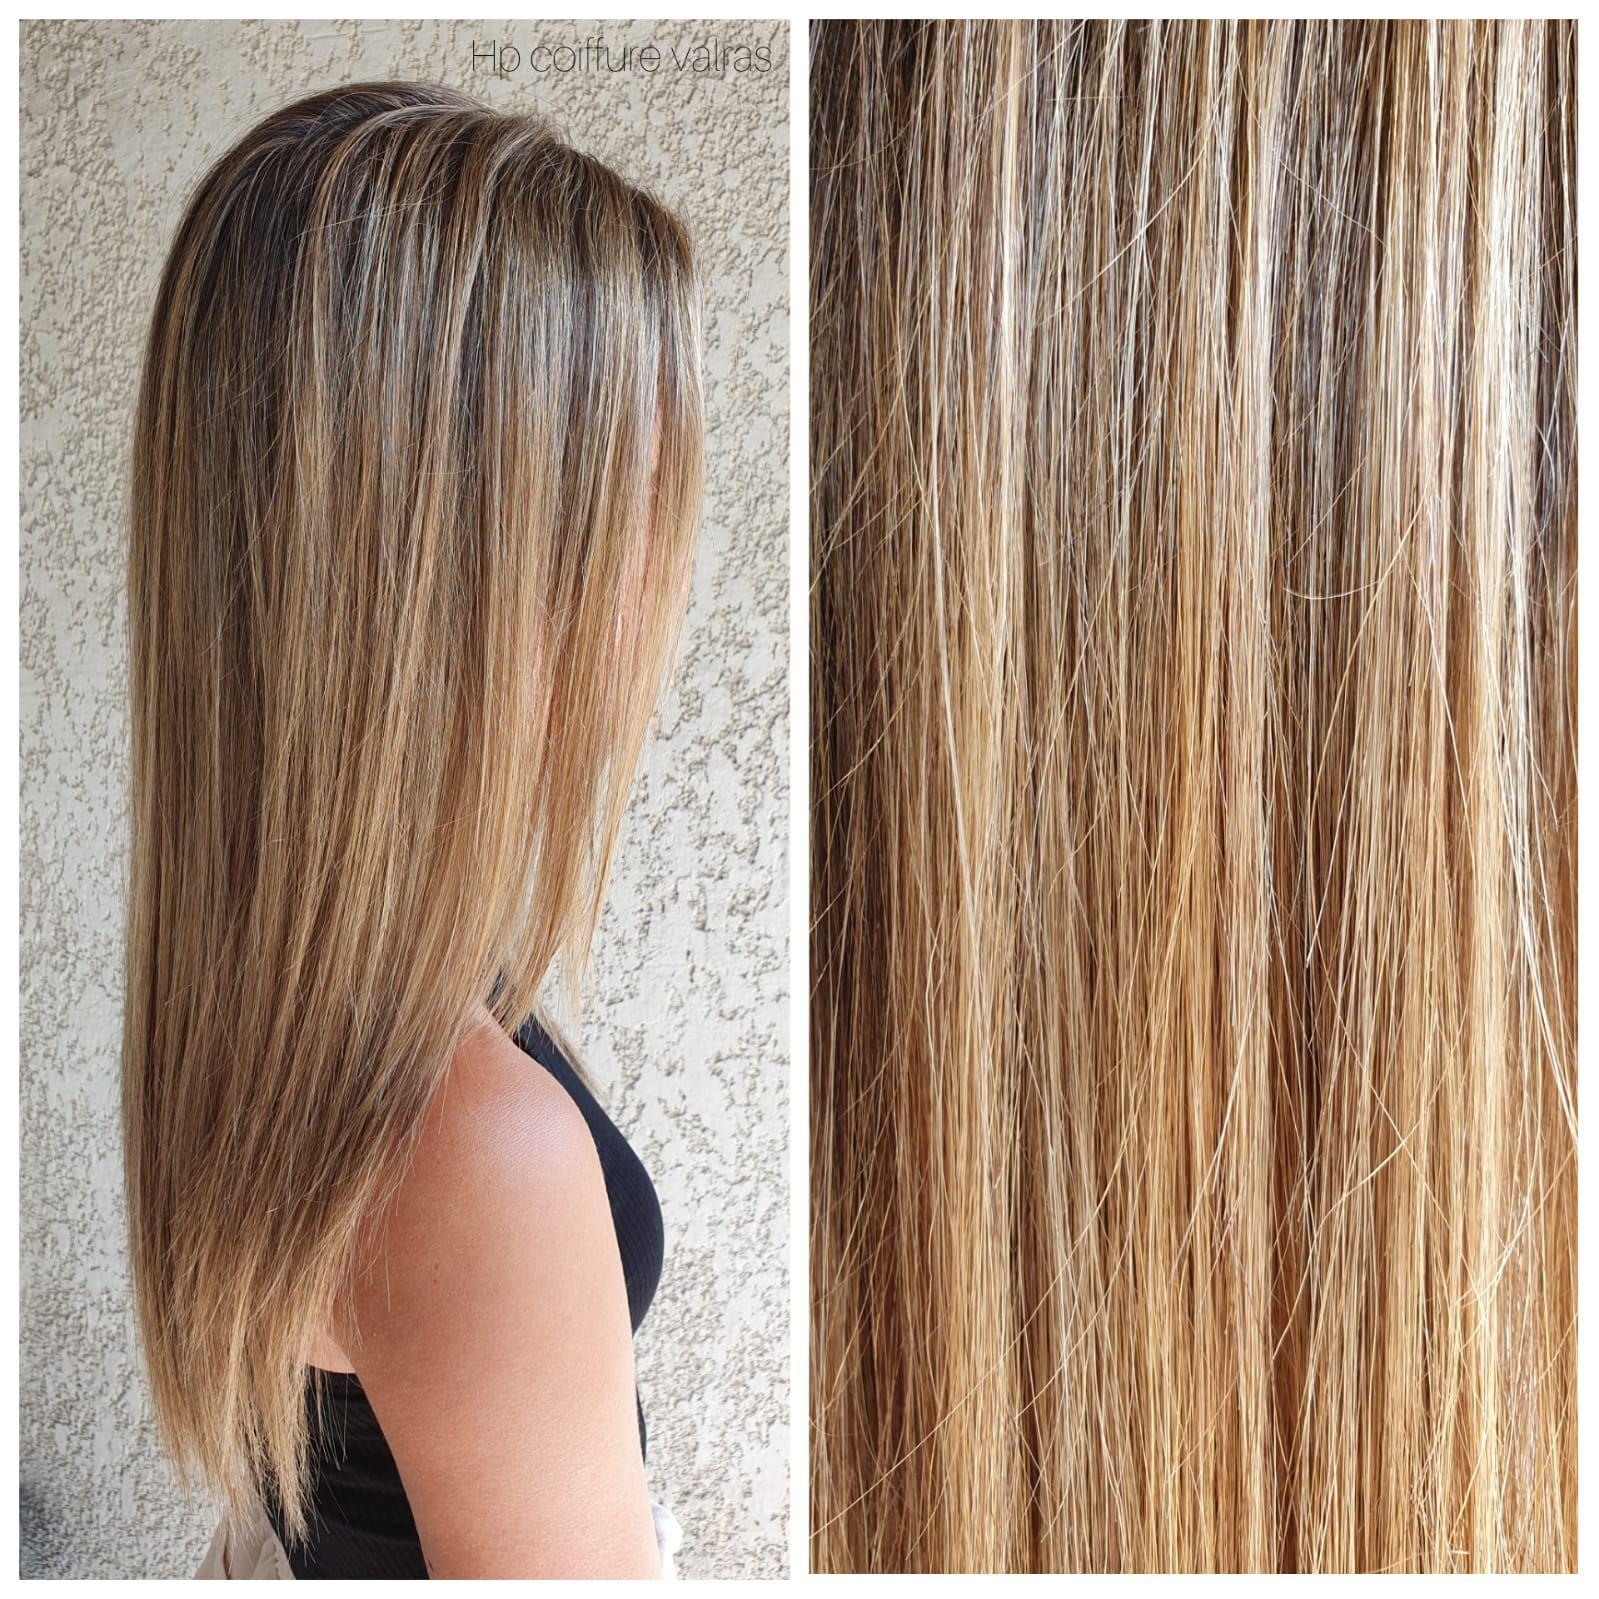 Blond Hpcoiffurevalras Valrasplage Coiffeur Coloriste Lorealpro Blondhair Blondsurmesure Blond Meches Ombrehair Hightlight Hair Blond Meches Coiffeur